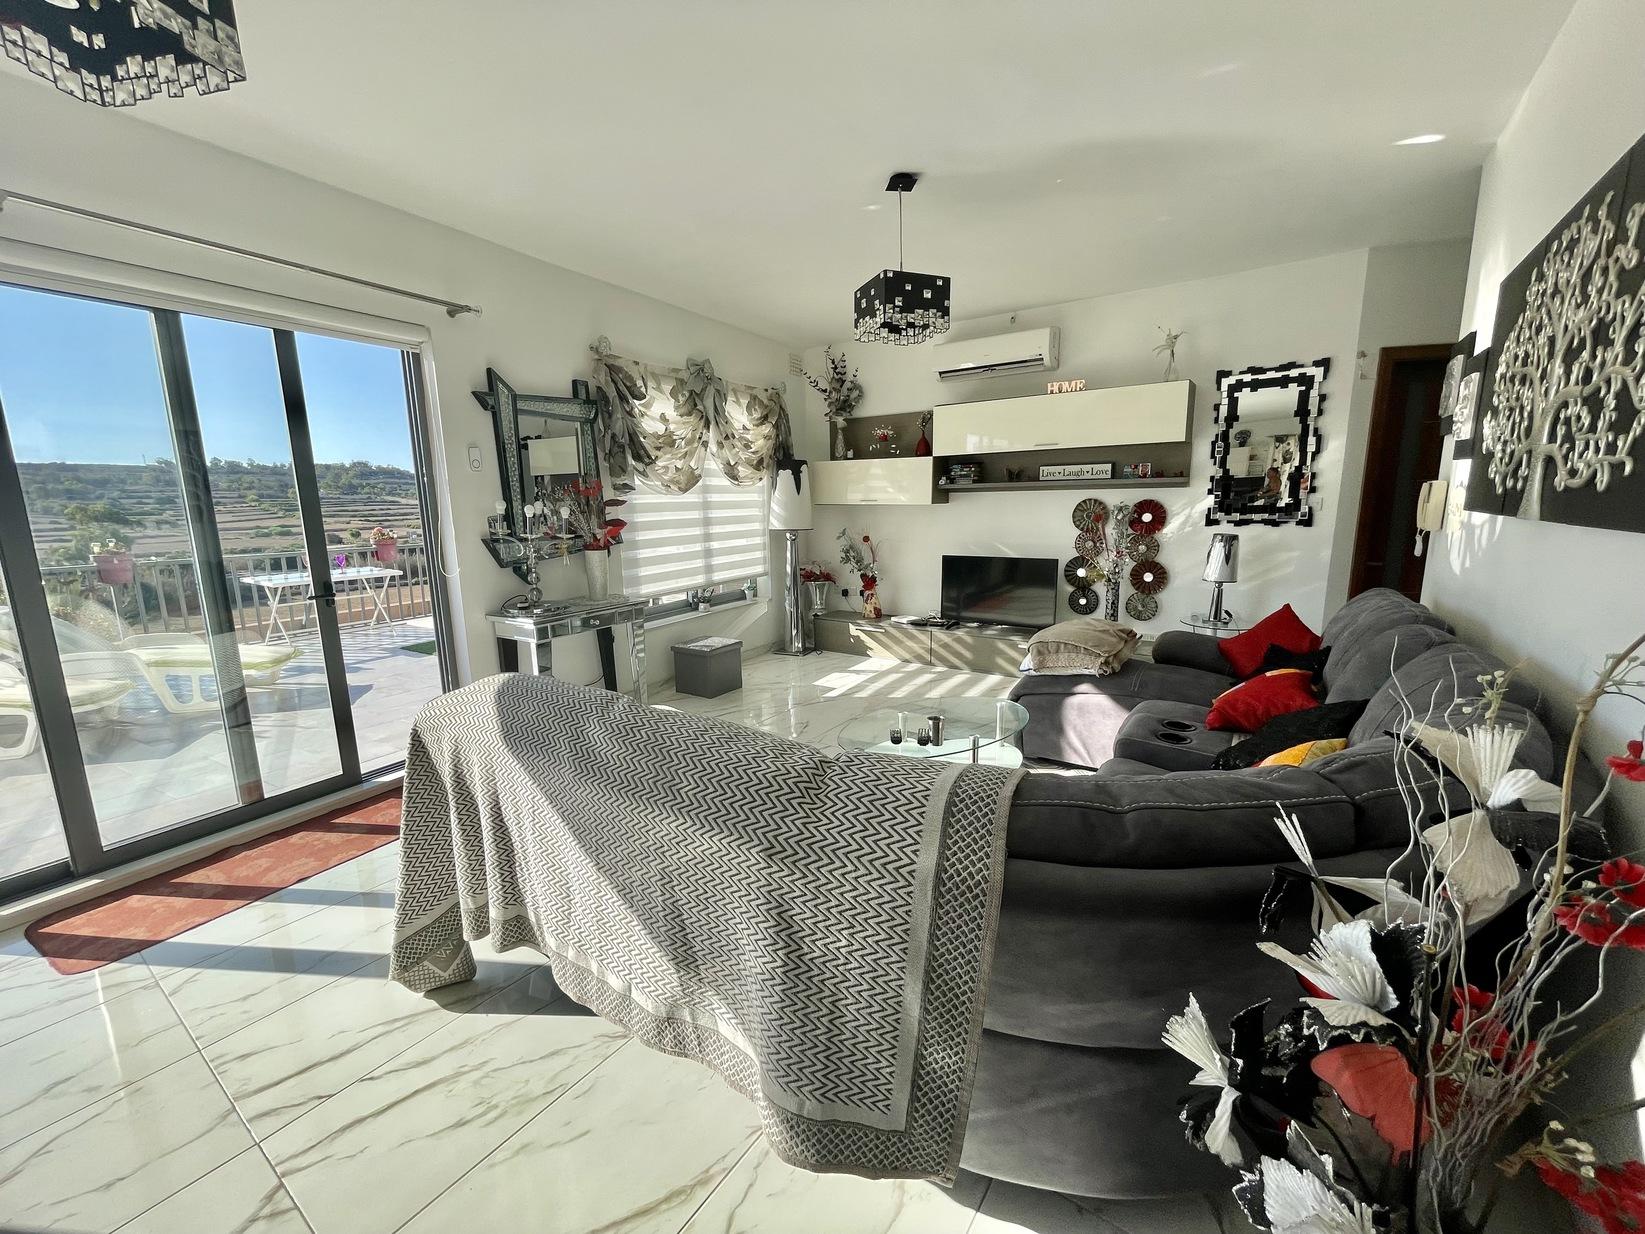 4 bed Penthouse For Rent in Marsaxlokk, Marsaxlokk - thumb 3